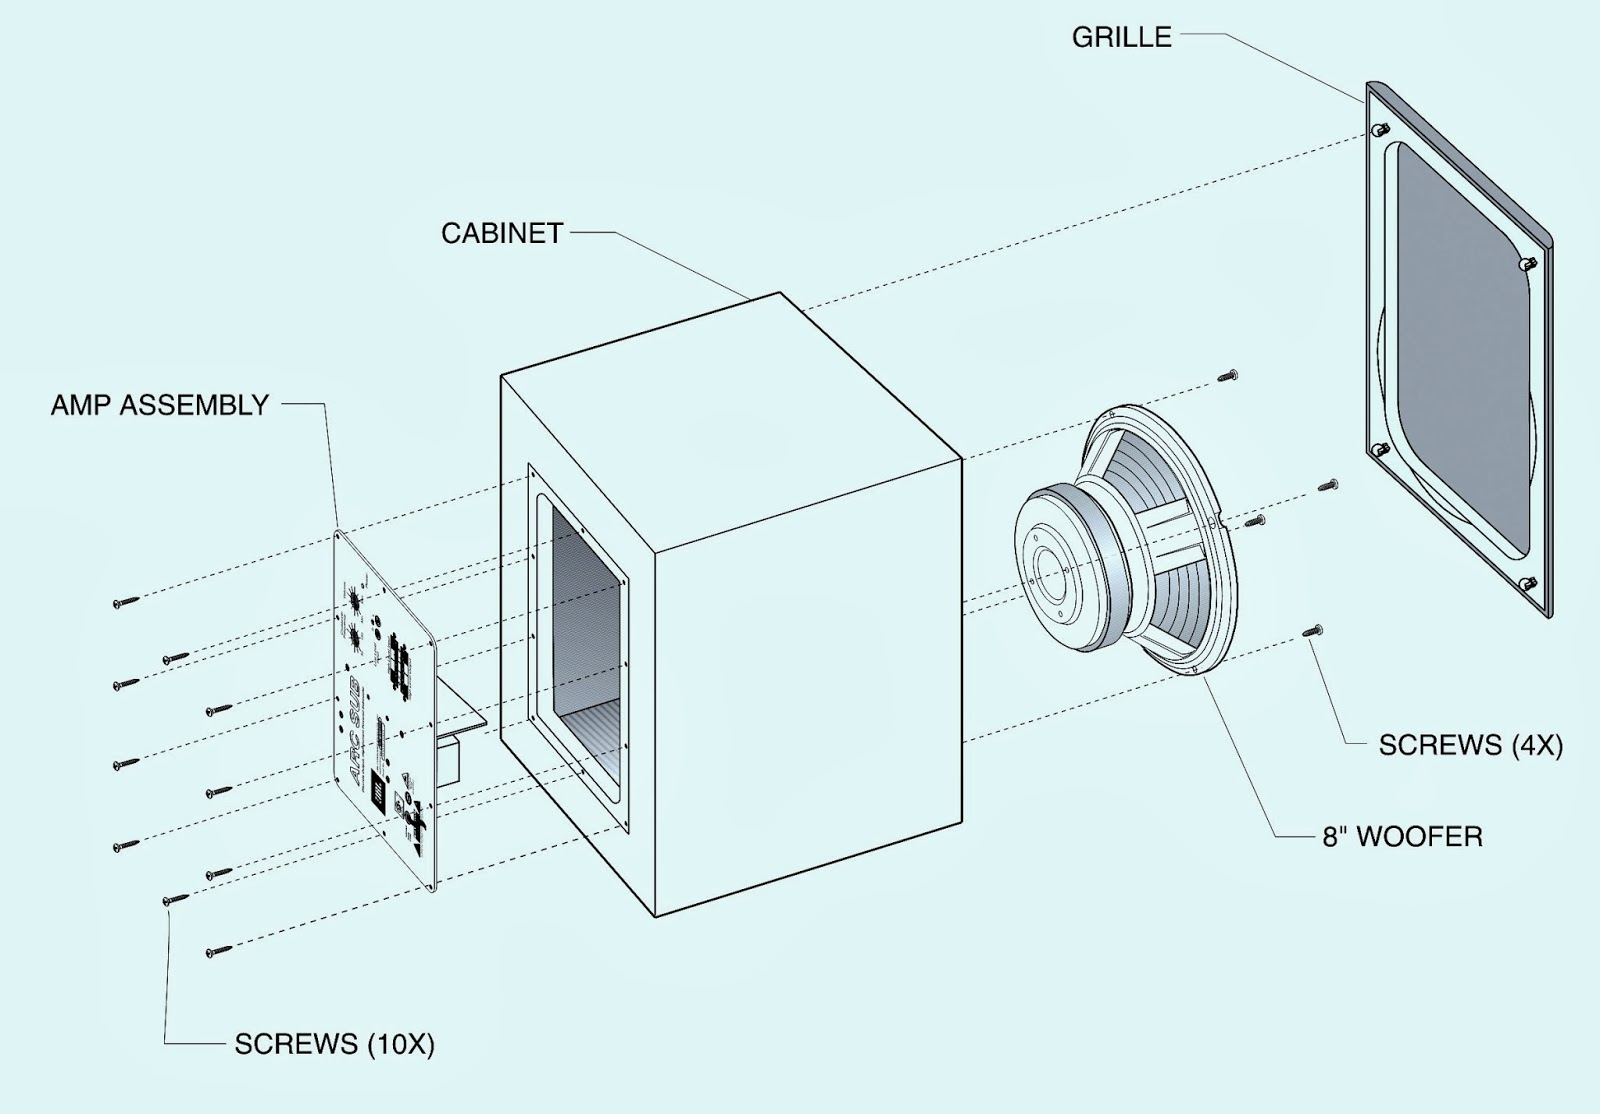 jbl arc sub test procedure schematic diagram circuit diagram jbl arc [ 1600 x 1114 Pixel ]